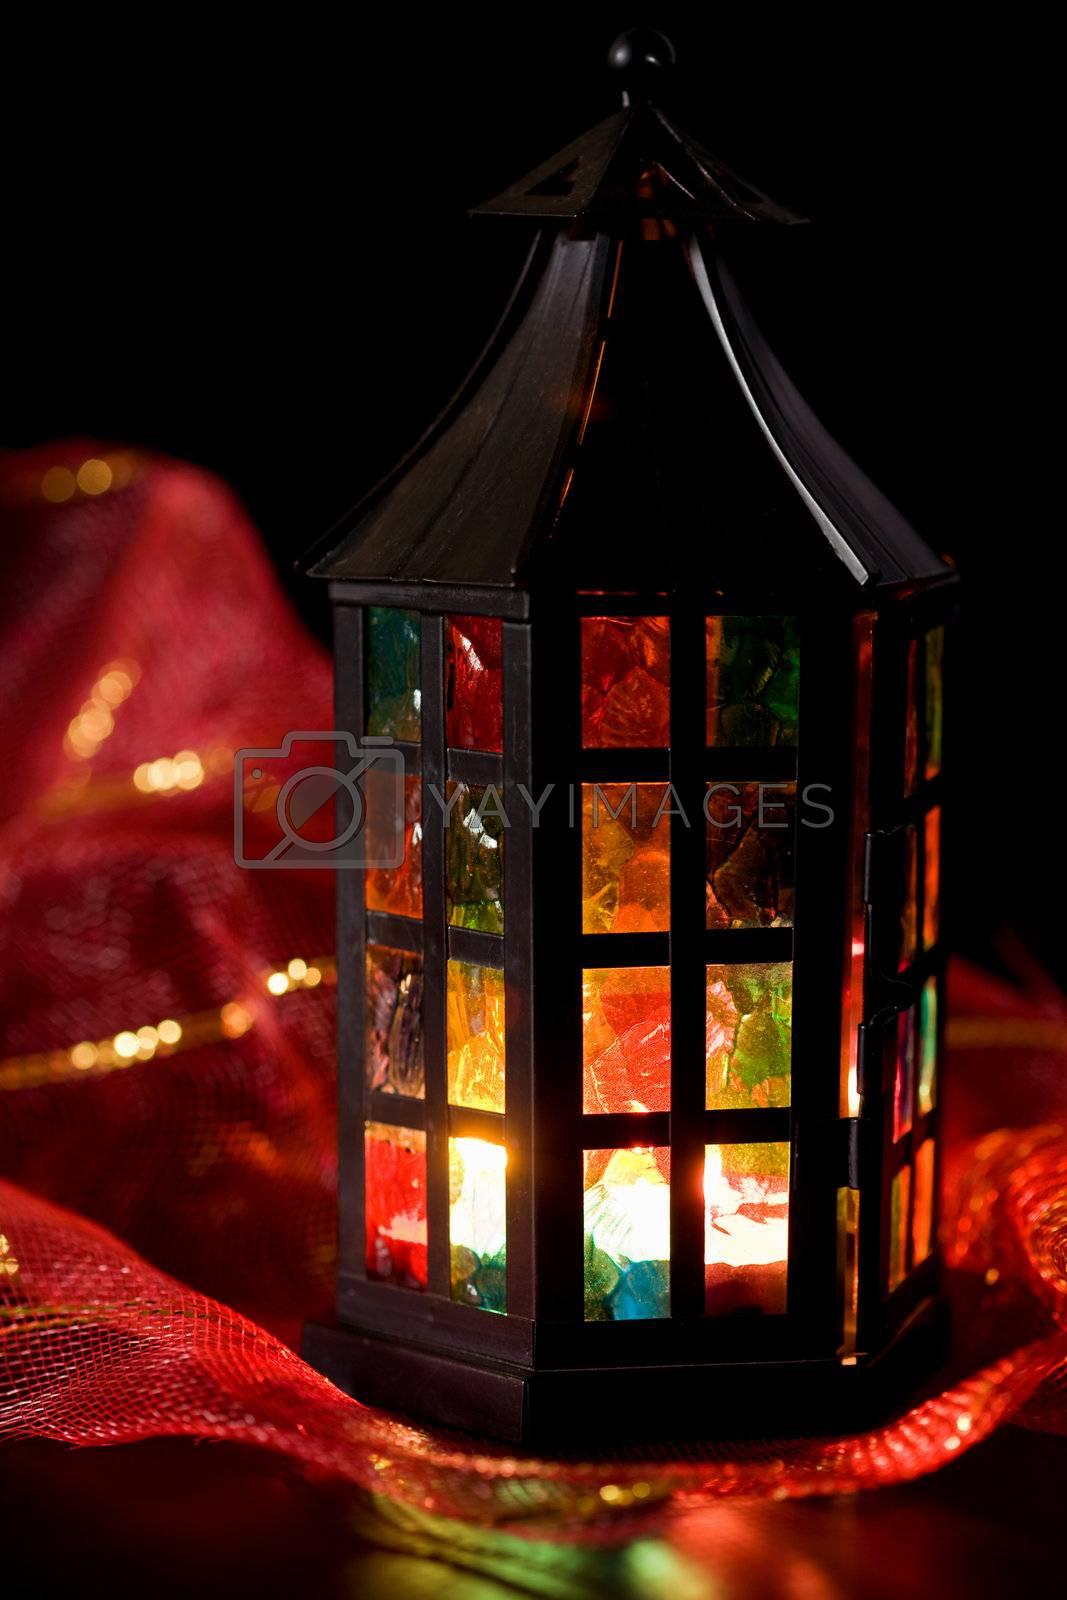 coloful lantern burning in the dark